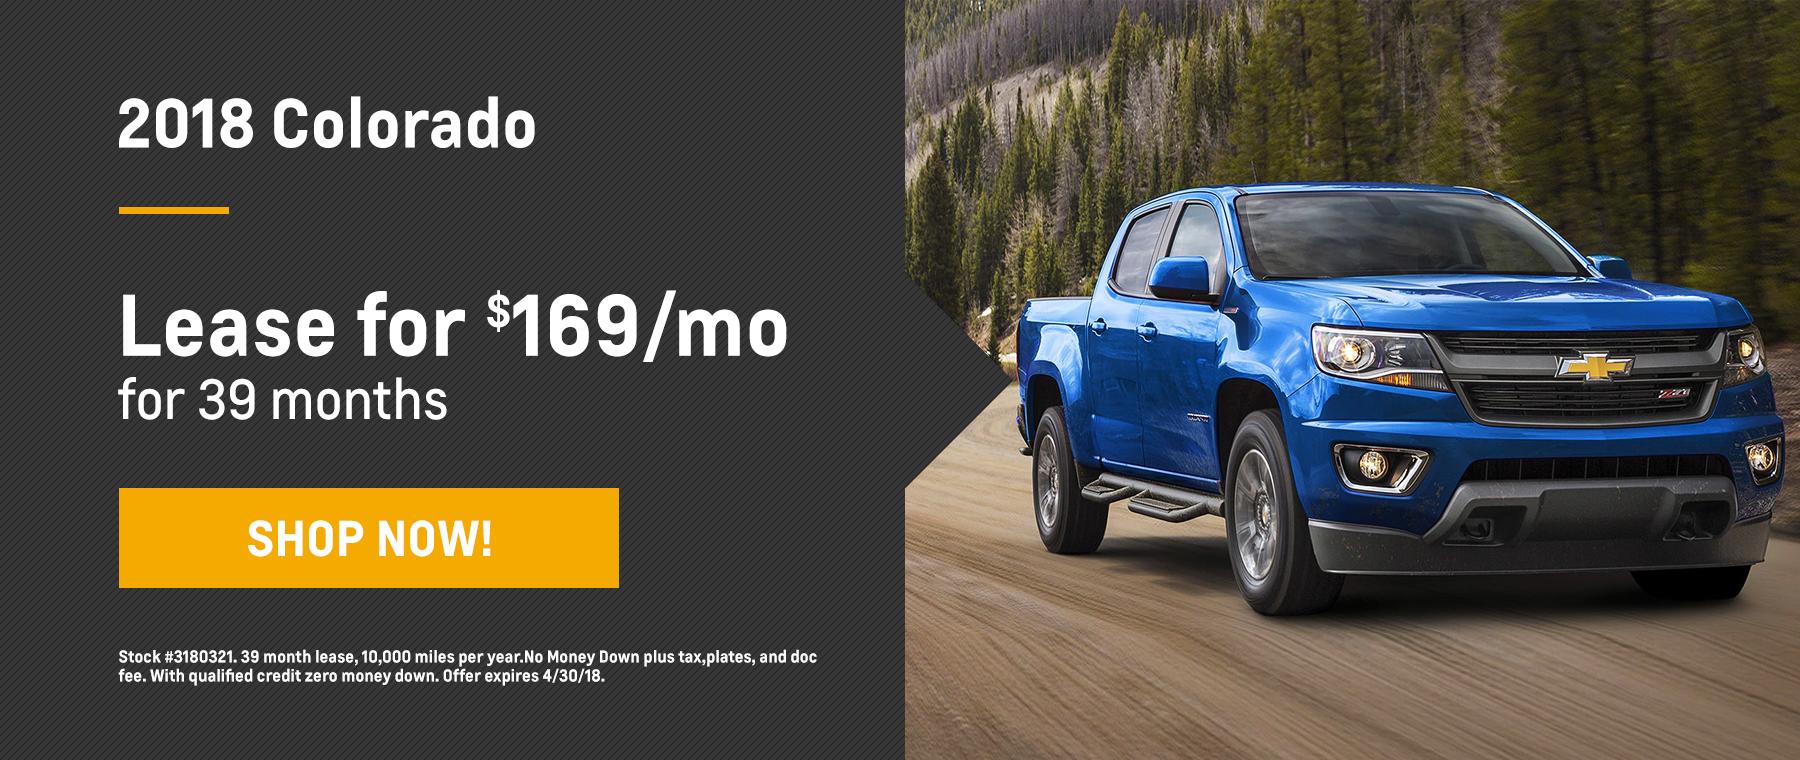 Colorado Biggers Chevrolet April Offer Homepage